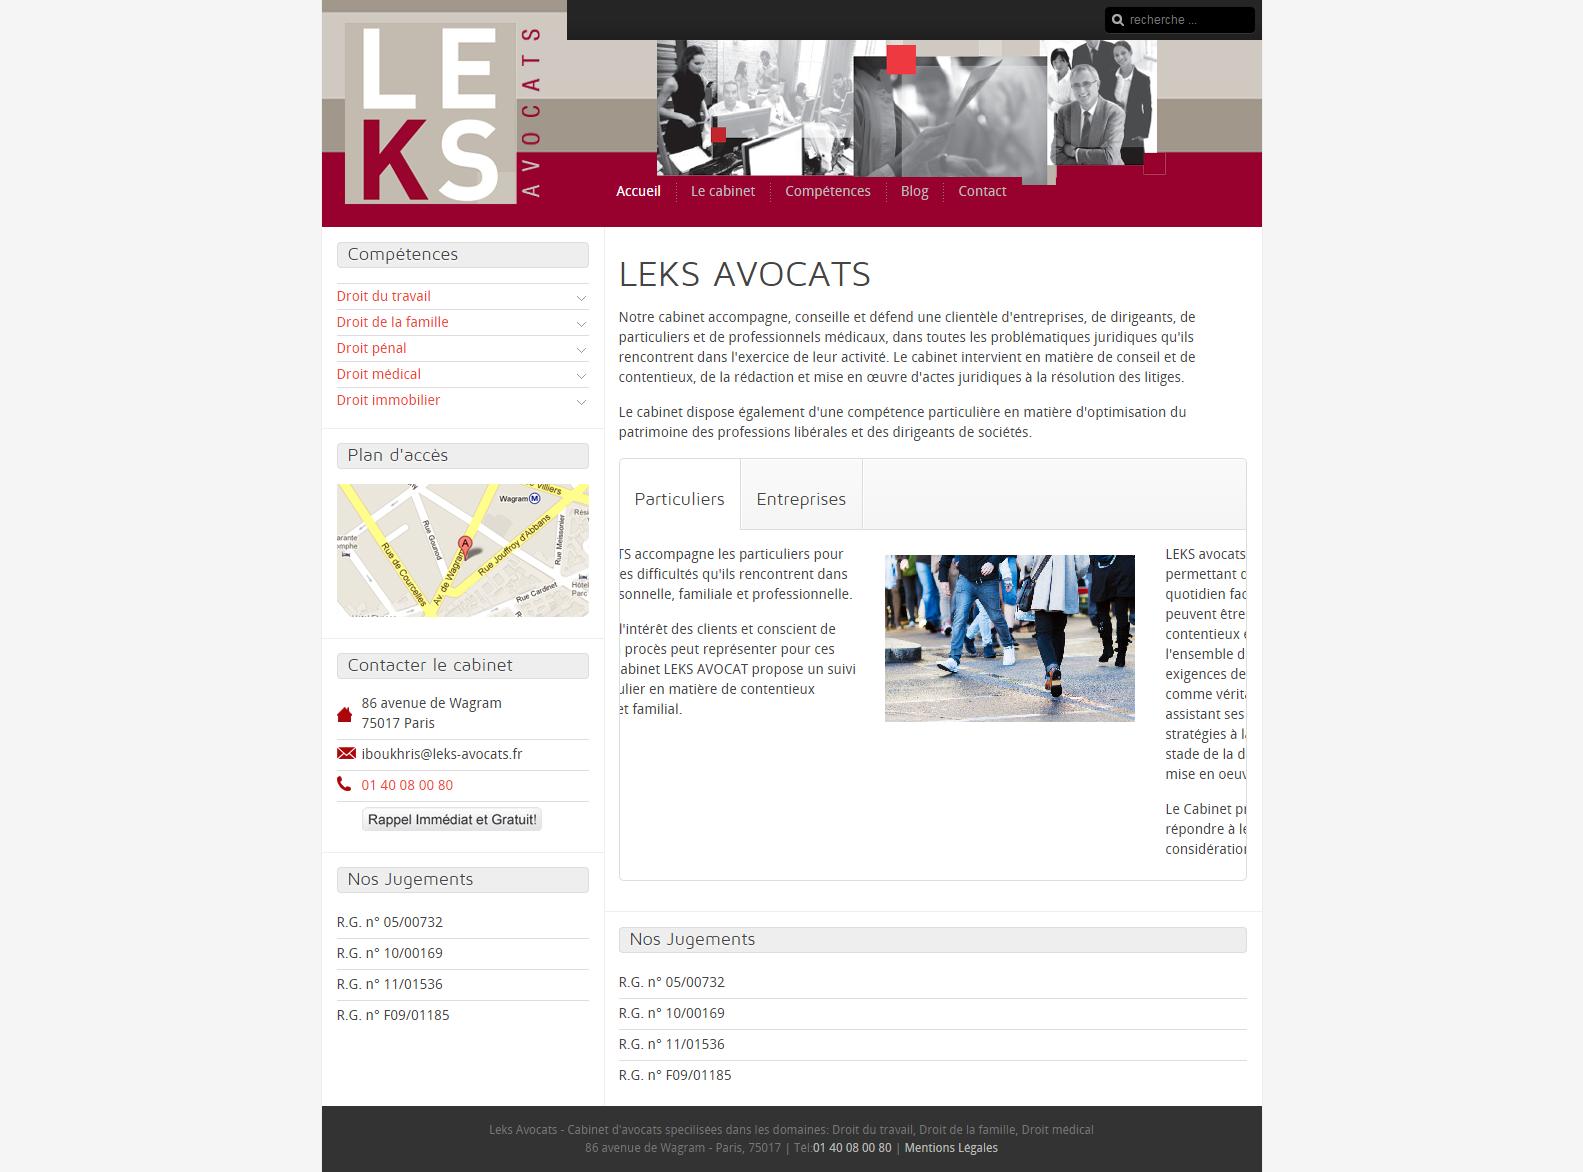 leks_avocats